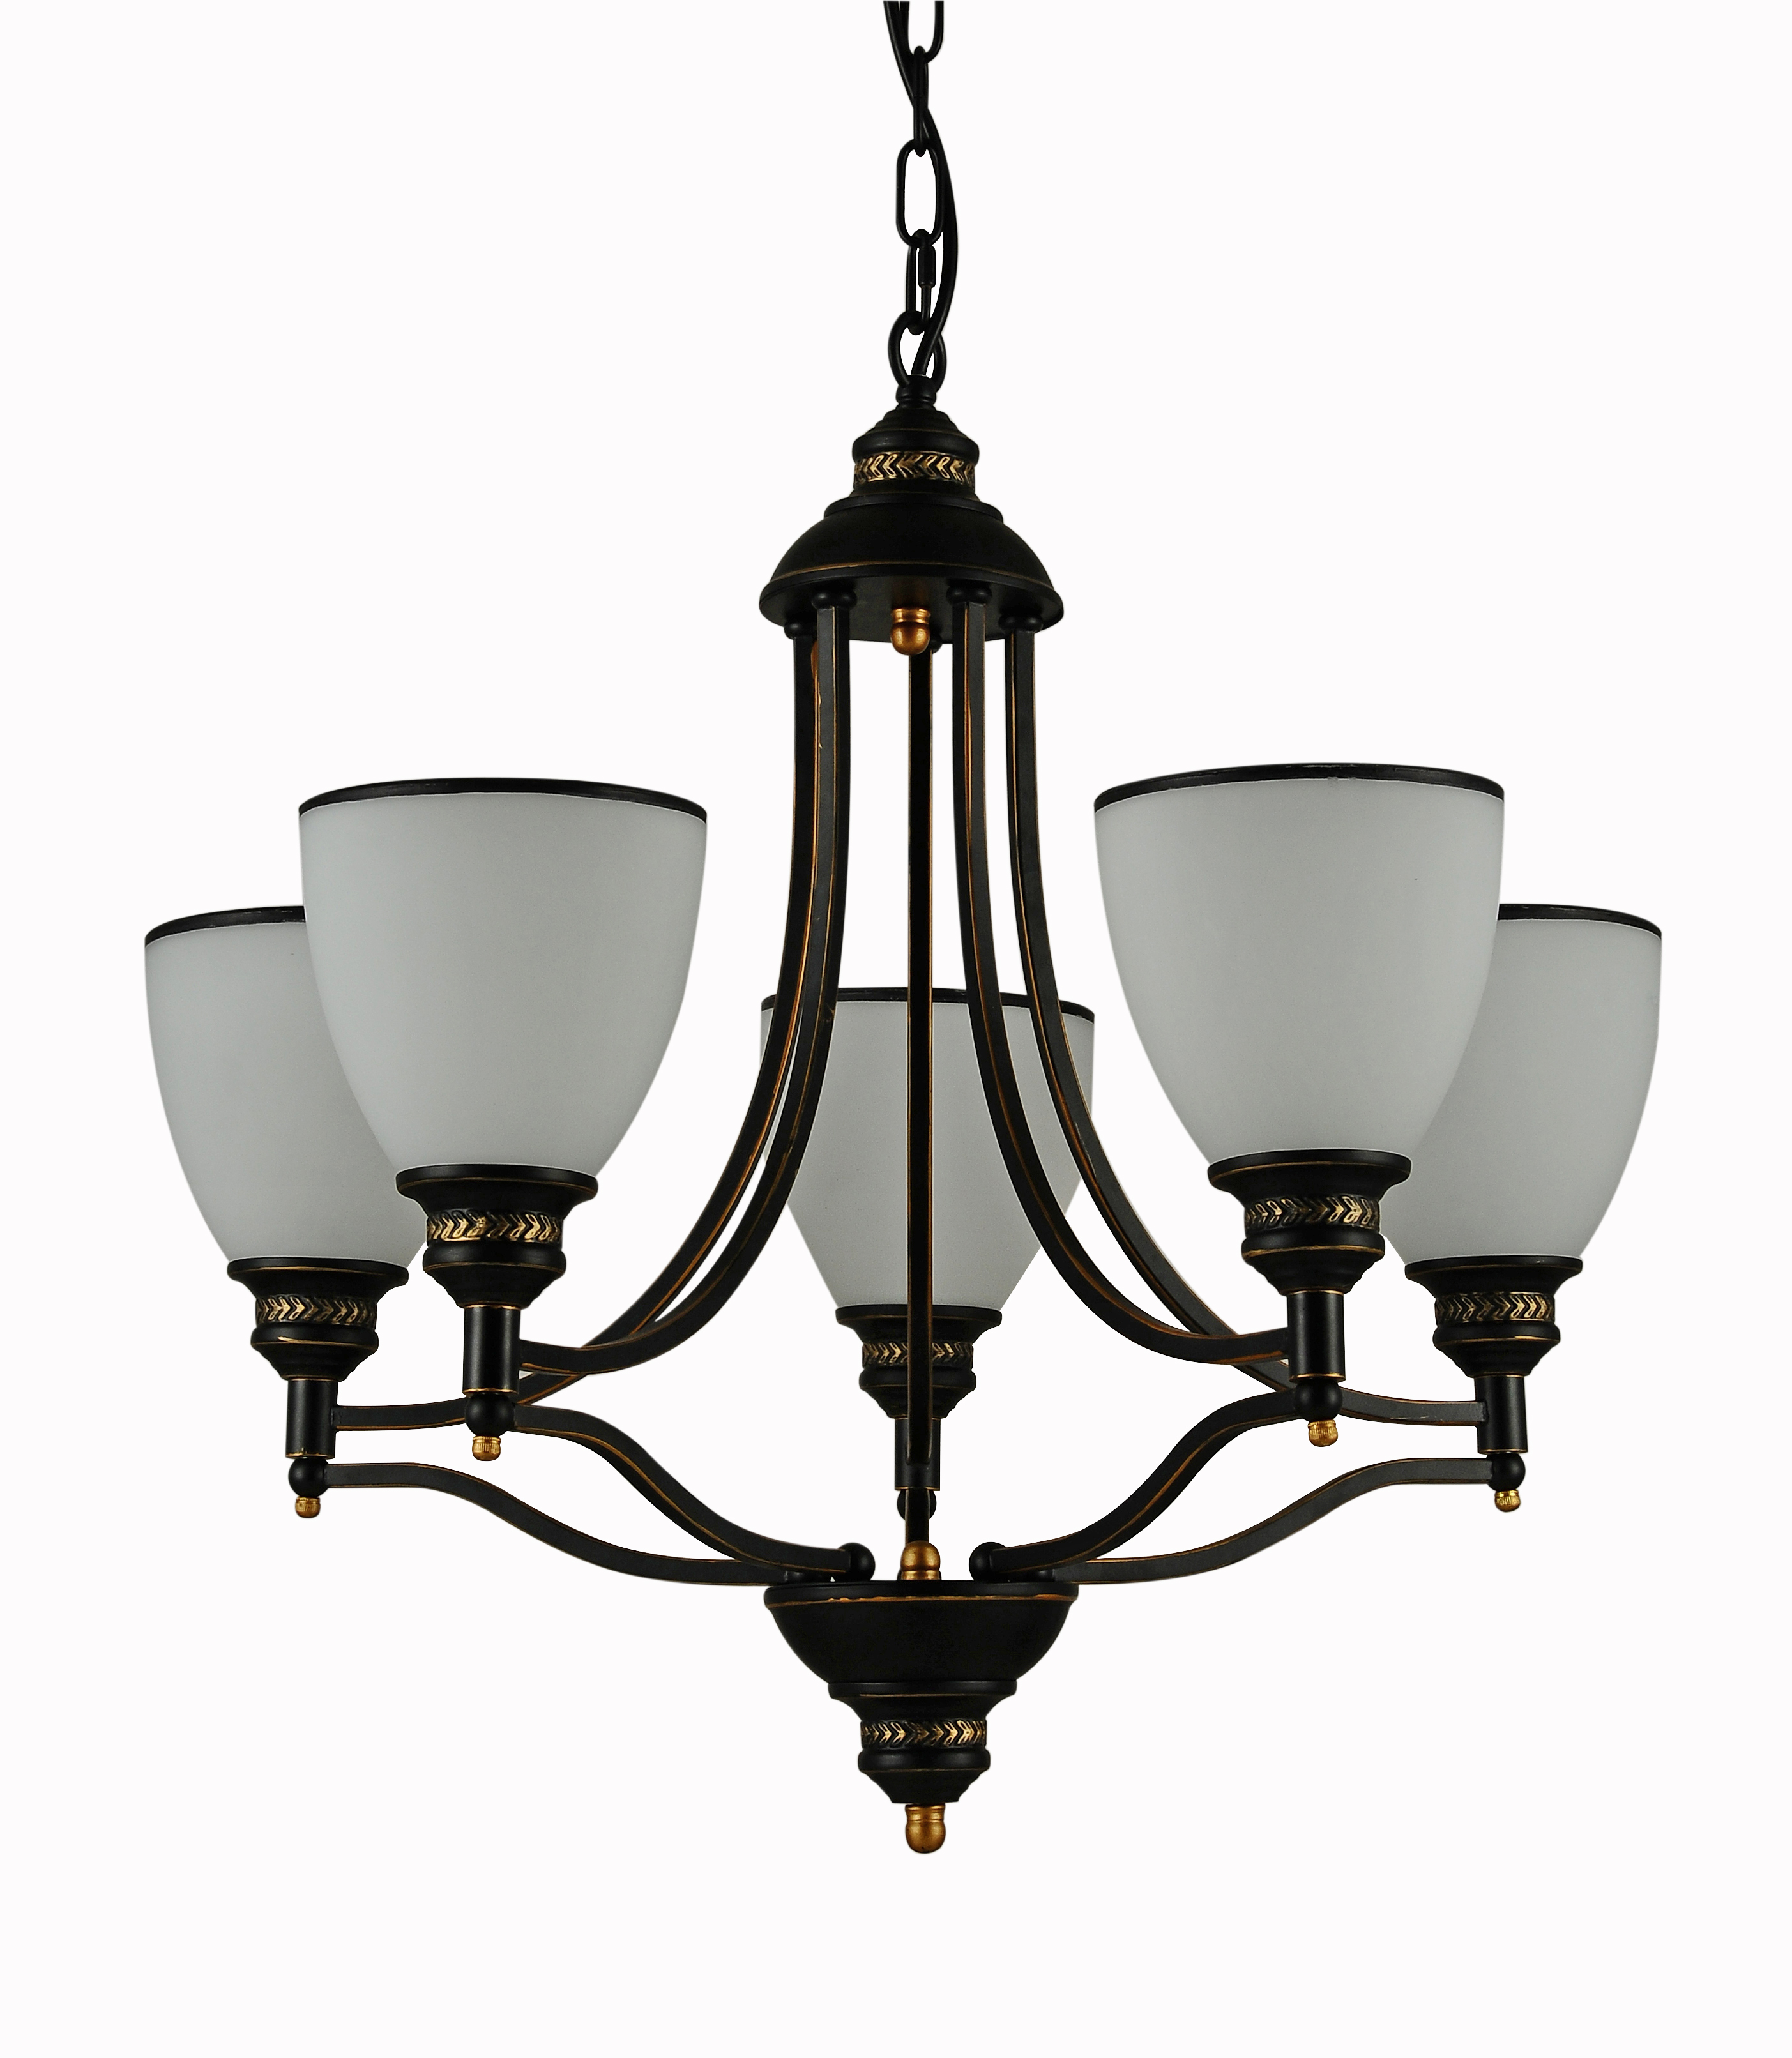 Dinette Chandelier Ceiling Lighting Lamp Vintage Fixture